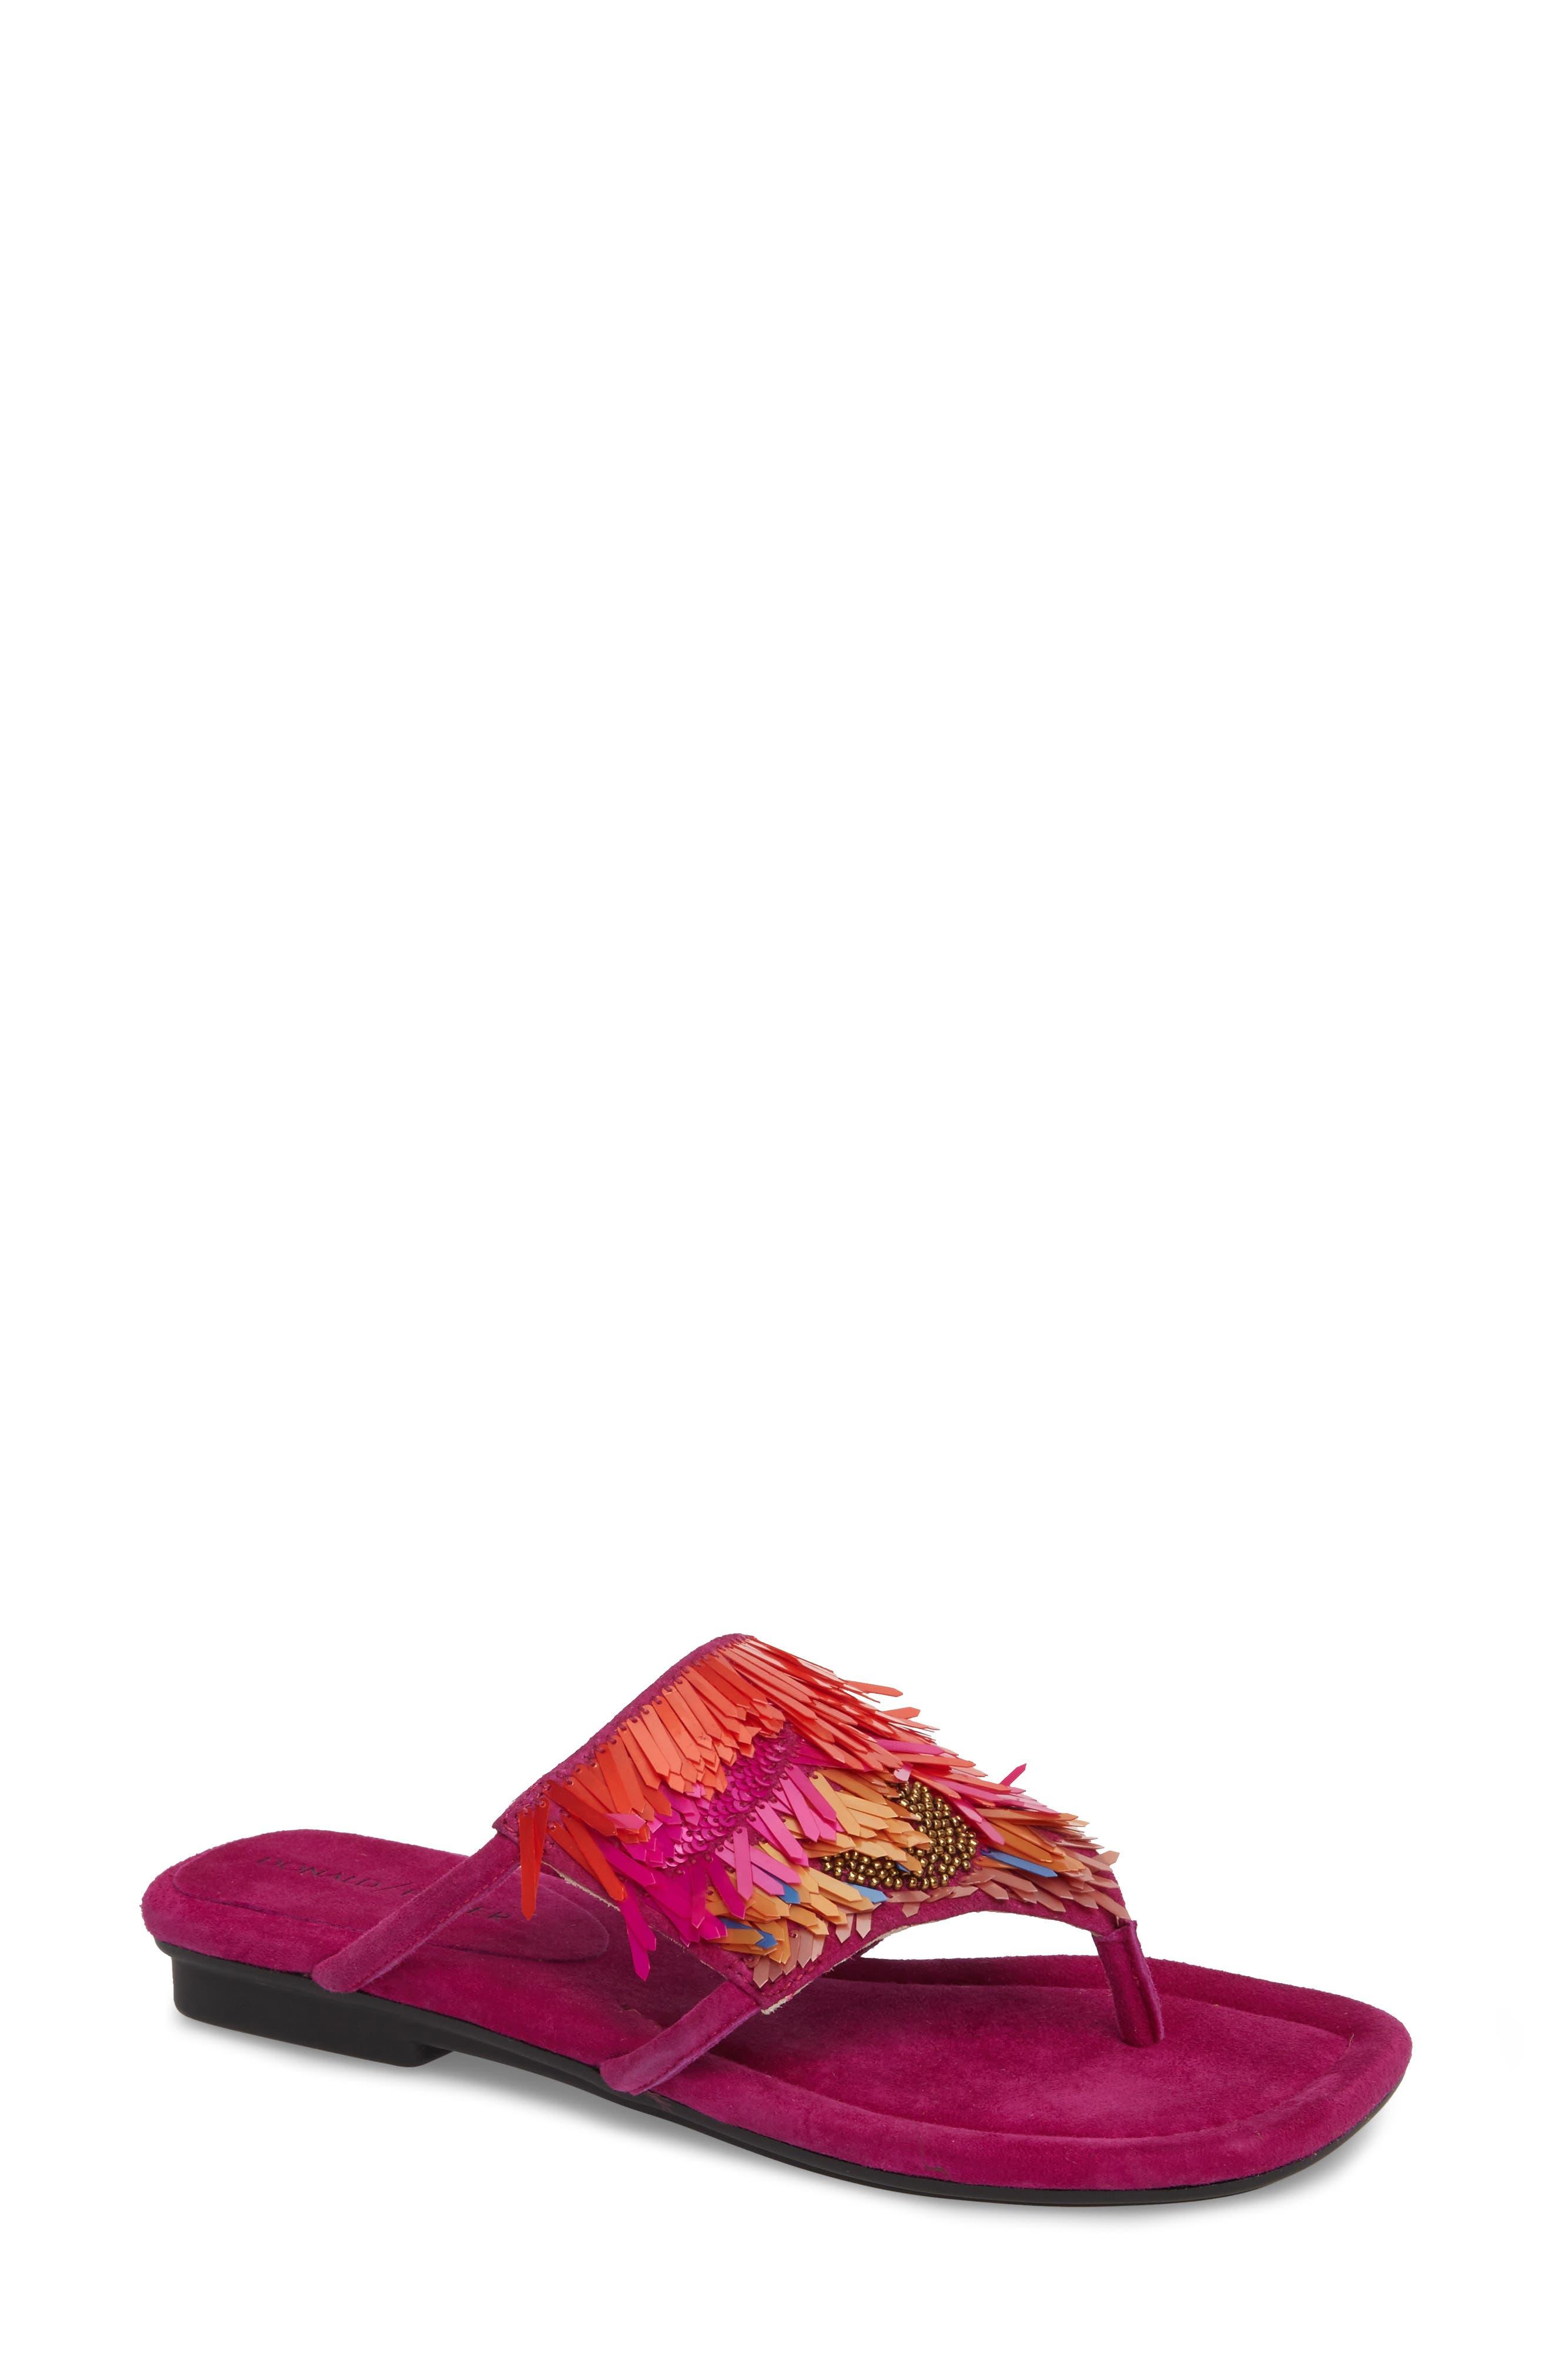 Donald Pliner Kya Feather Sequin Sandal (Women)